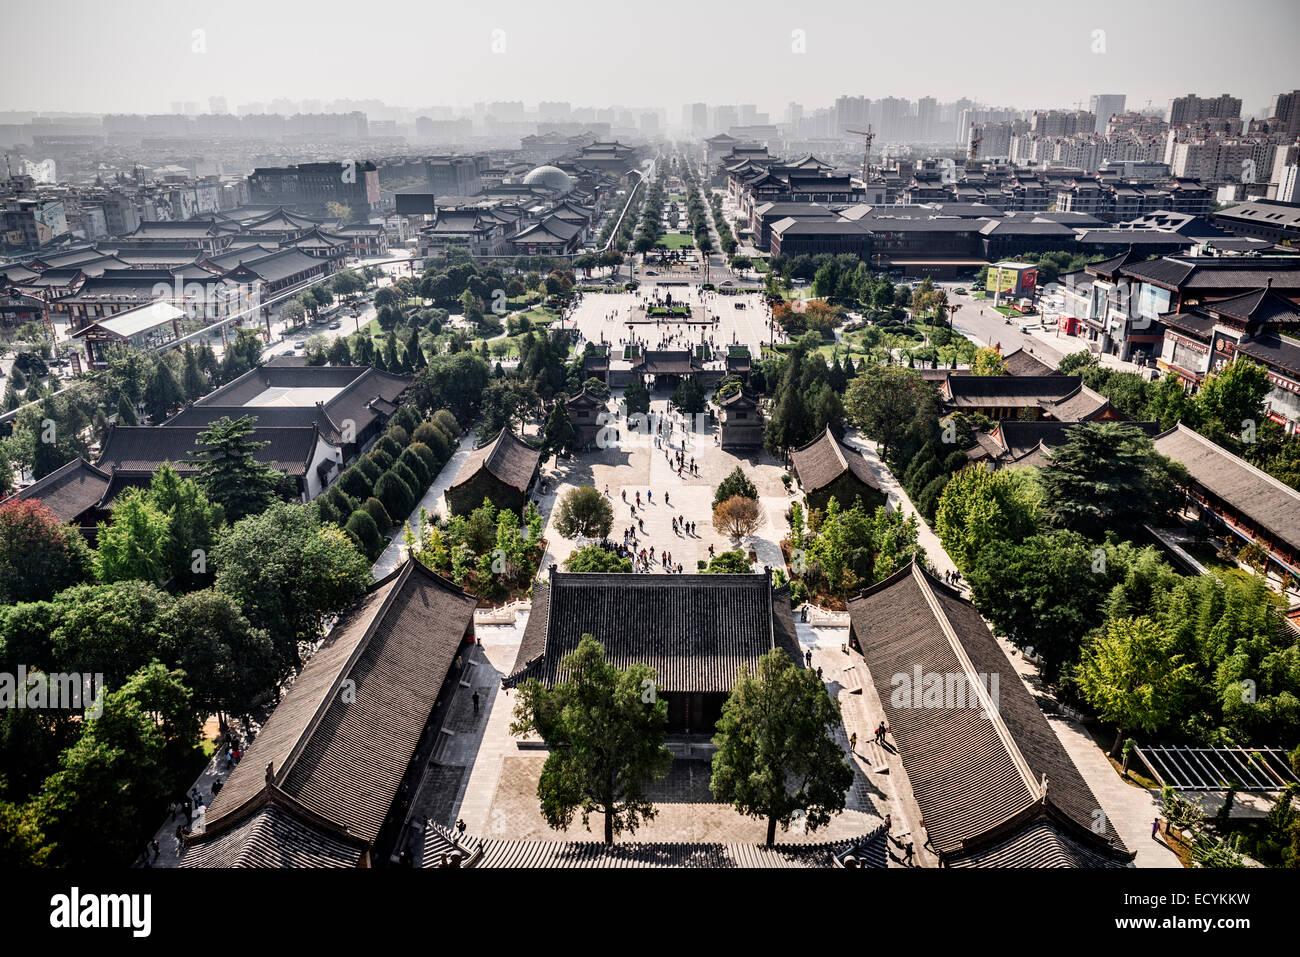 Xi'an aerial vue sur la ville de Giant Wild Goose Pagoda. Xi'an, Shaanxi, China 2014 Photo Stock